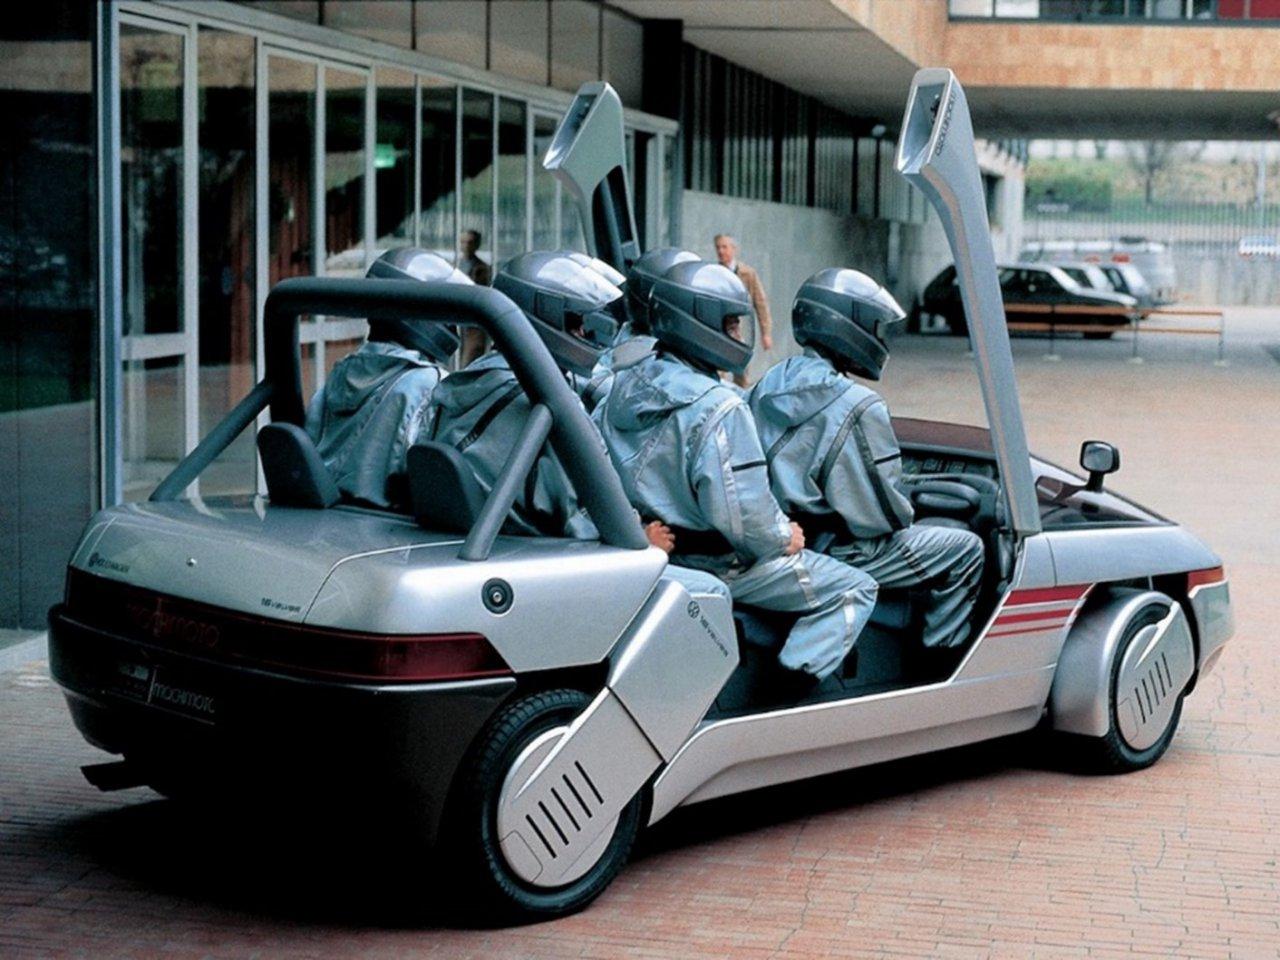 Italdesign Machimoto Volkswagen concept car